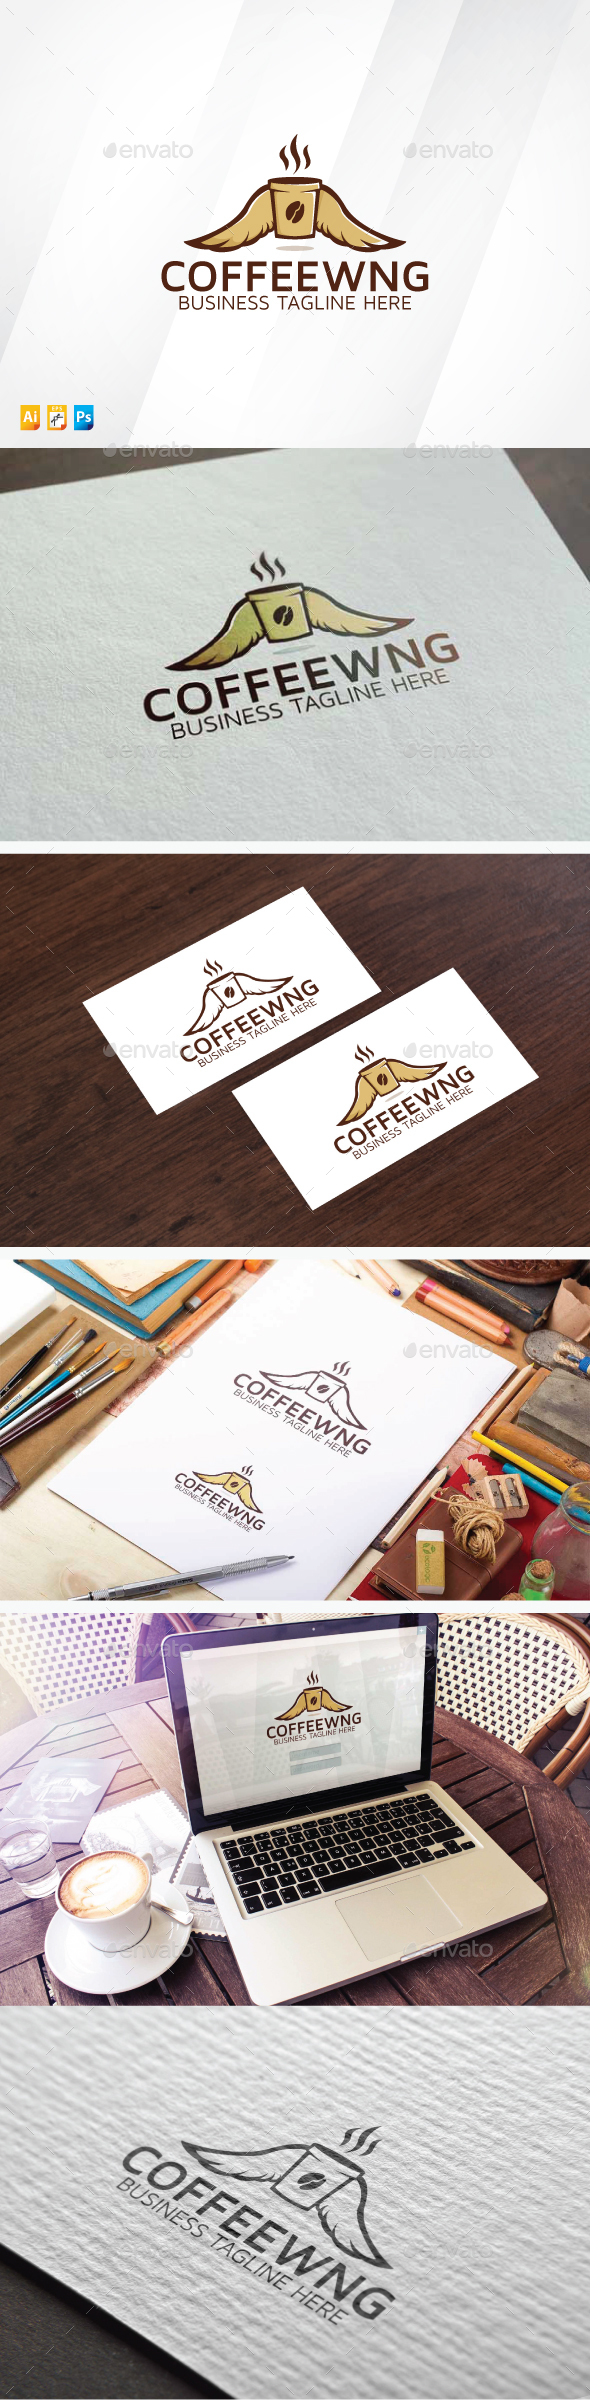 Coffee Wings Logo - Food Logo Templates